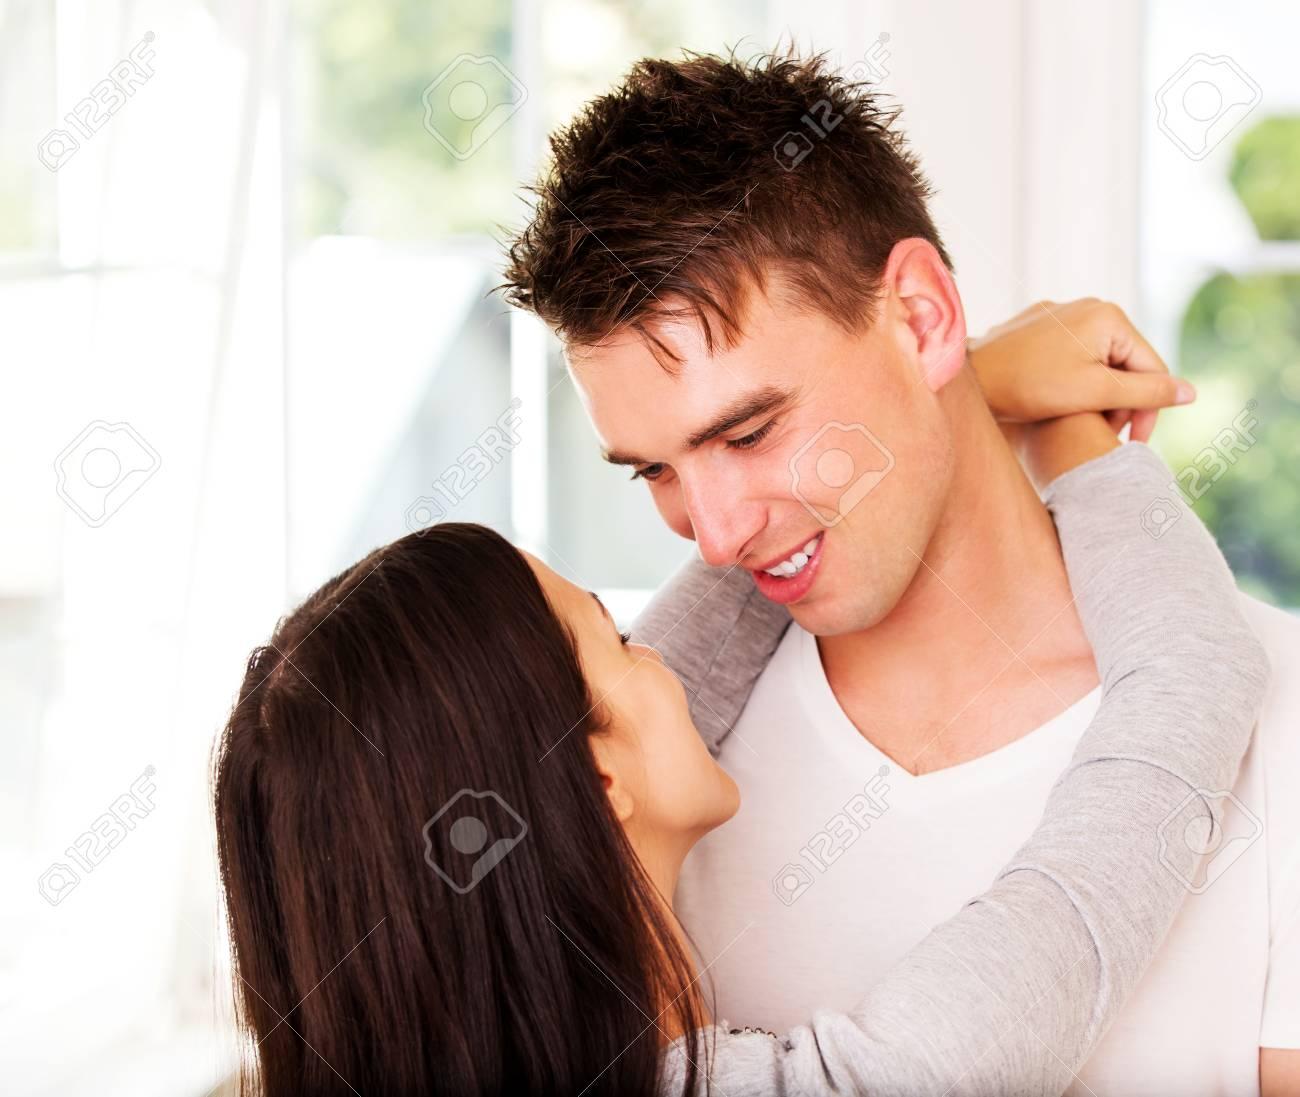 dating site lovetime